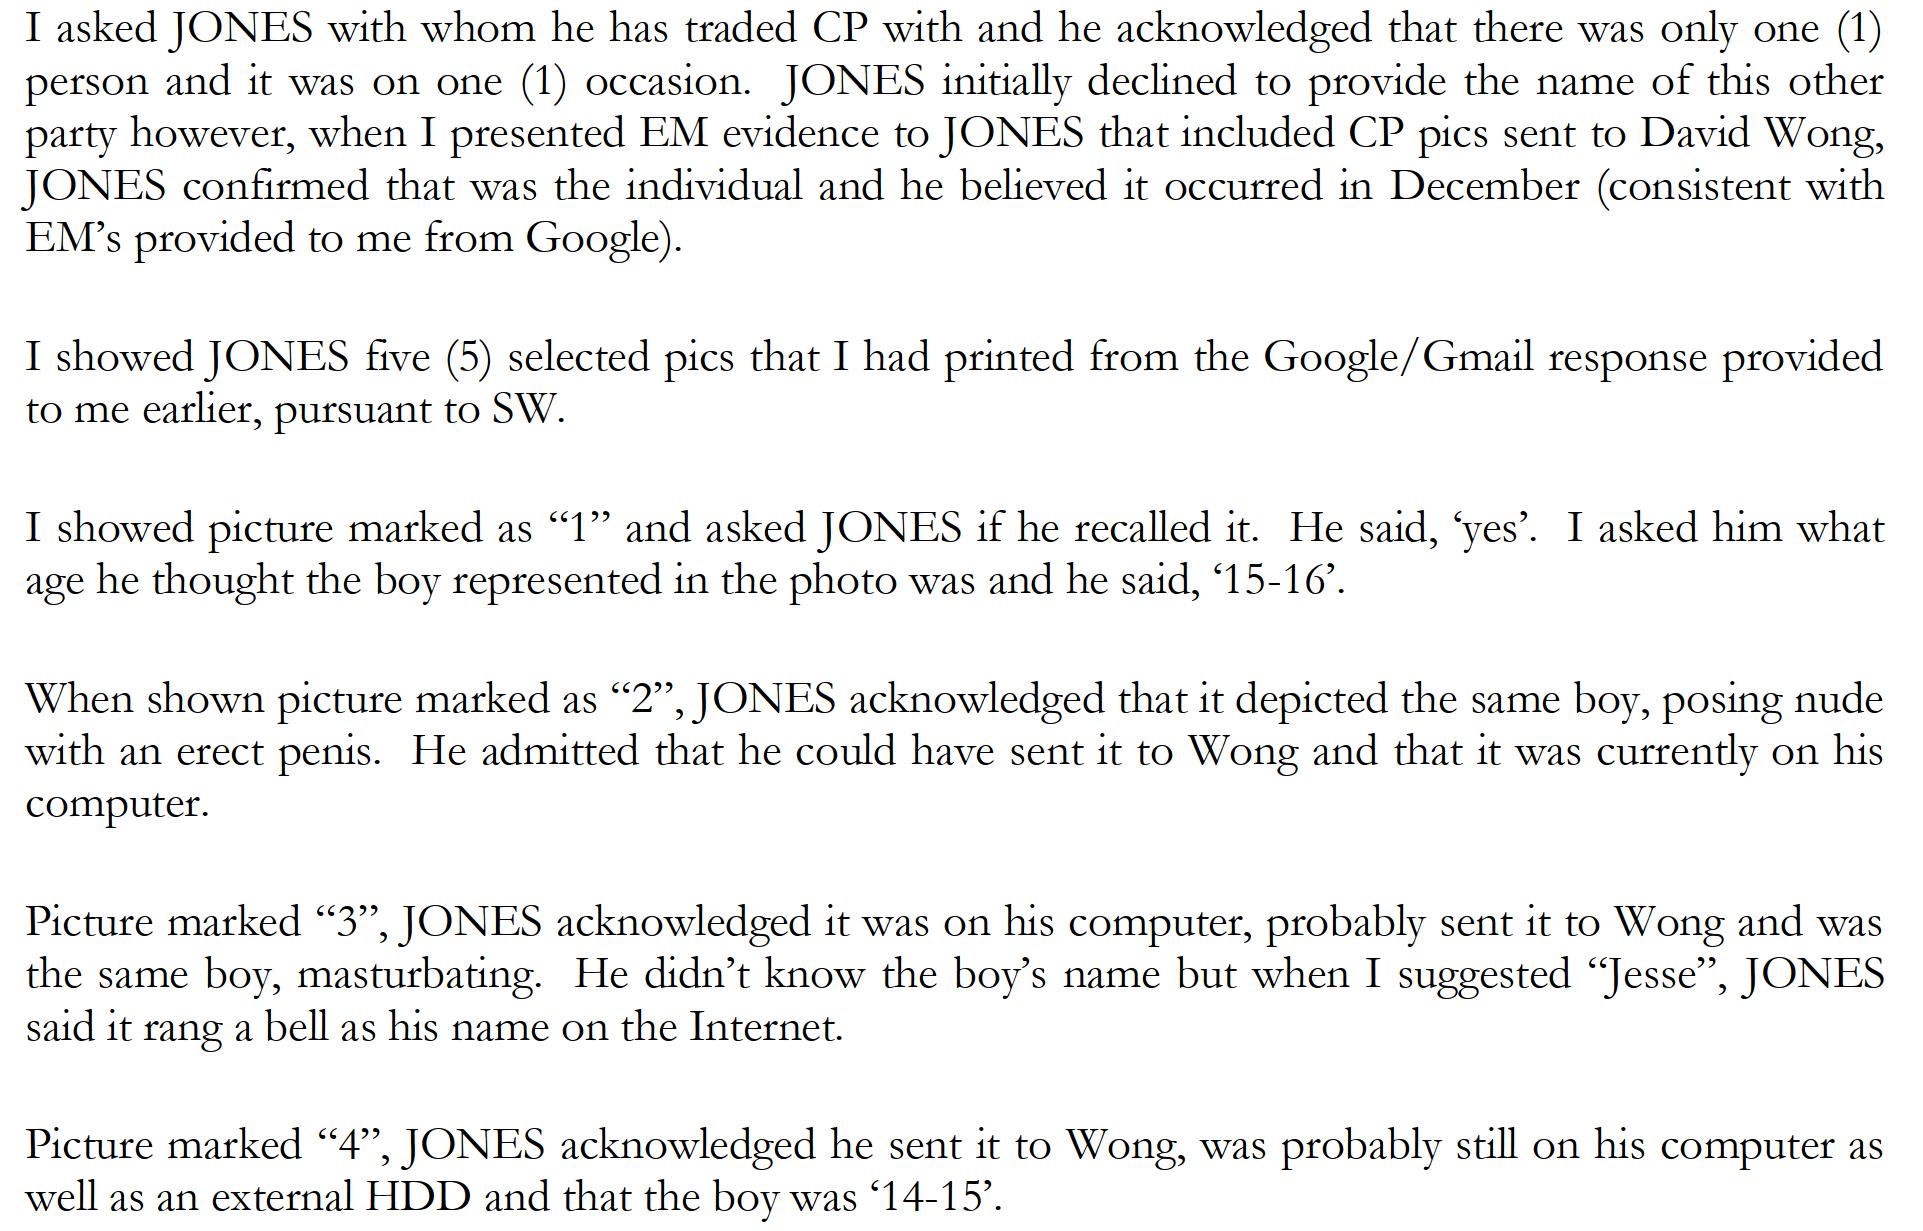 Jones admits guilt